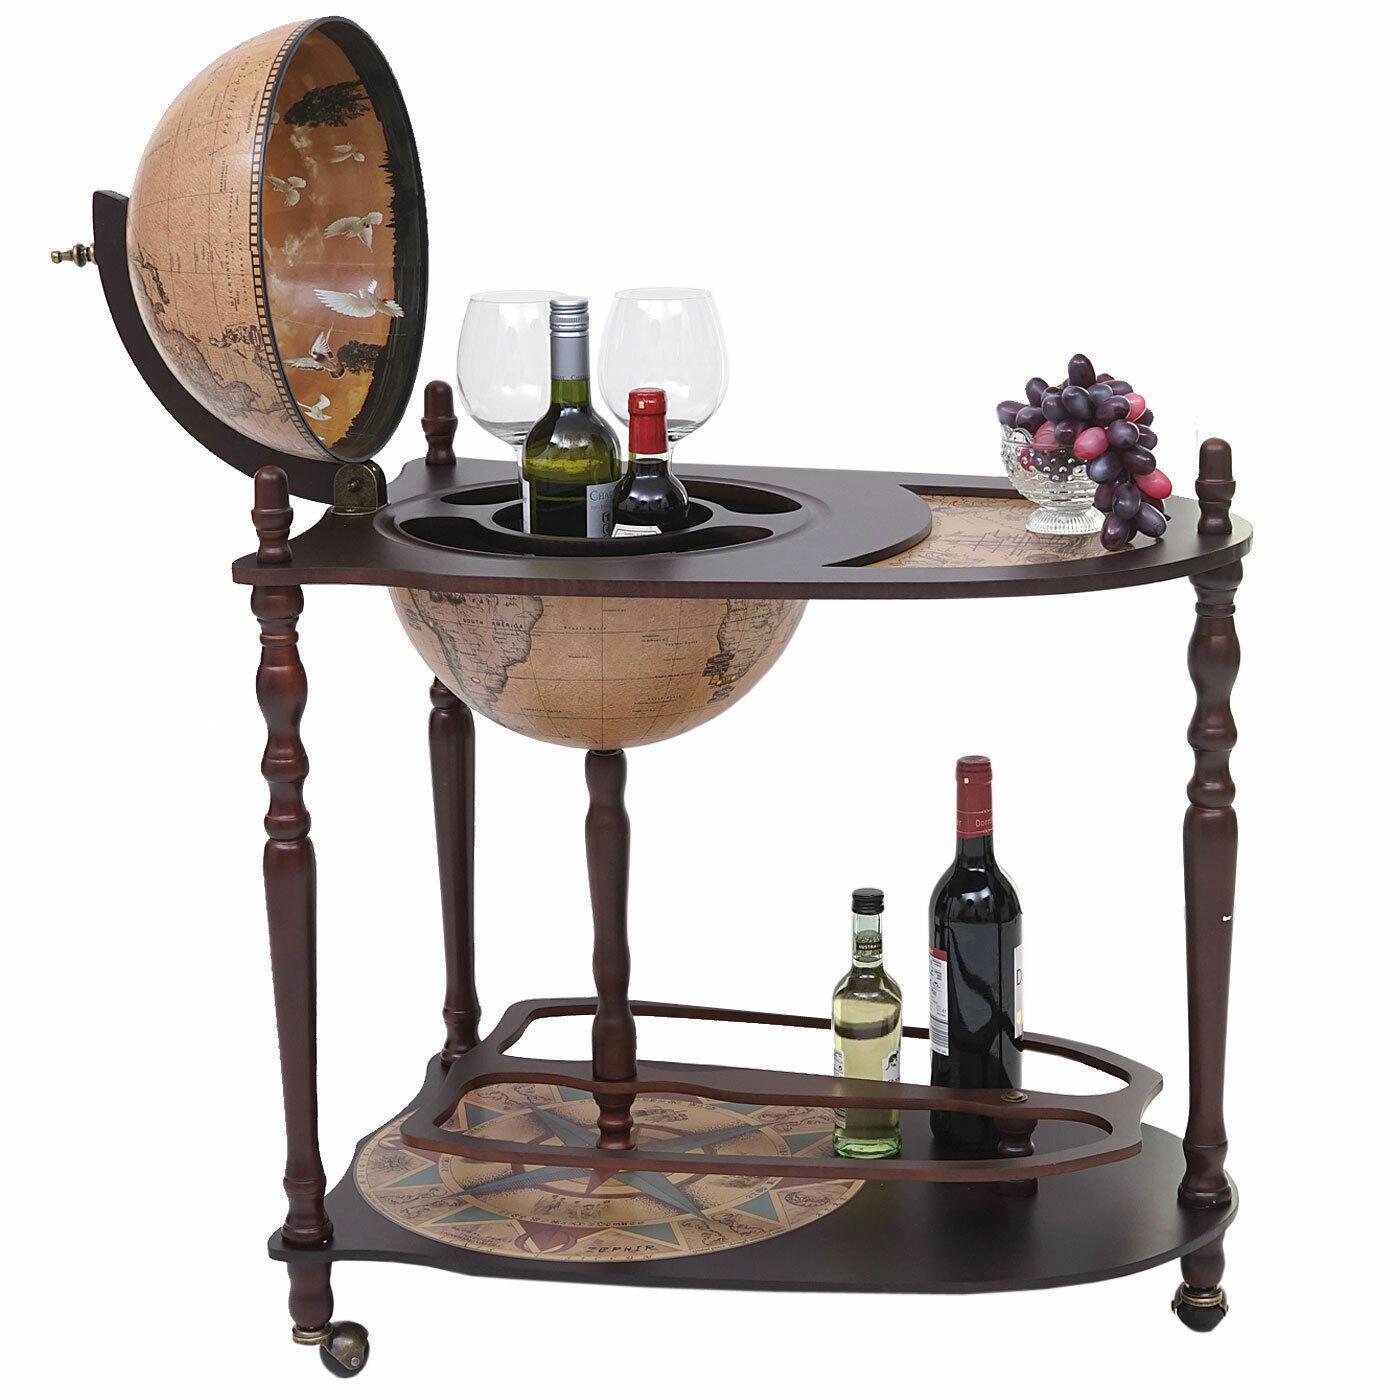 Hwc-t875 globusbar avec table, le bois d'eucalyptus, tischbar Placard à alcool T'Globe roulant